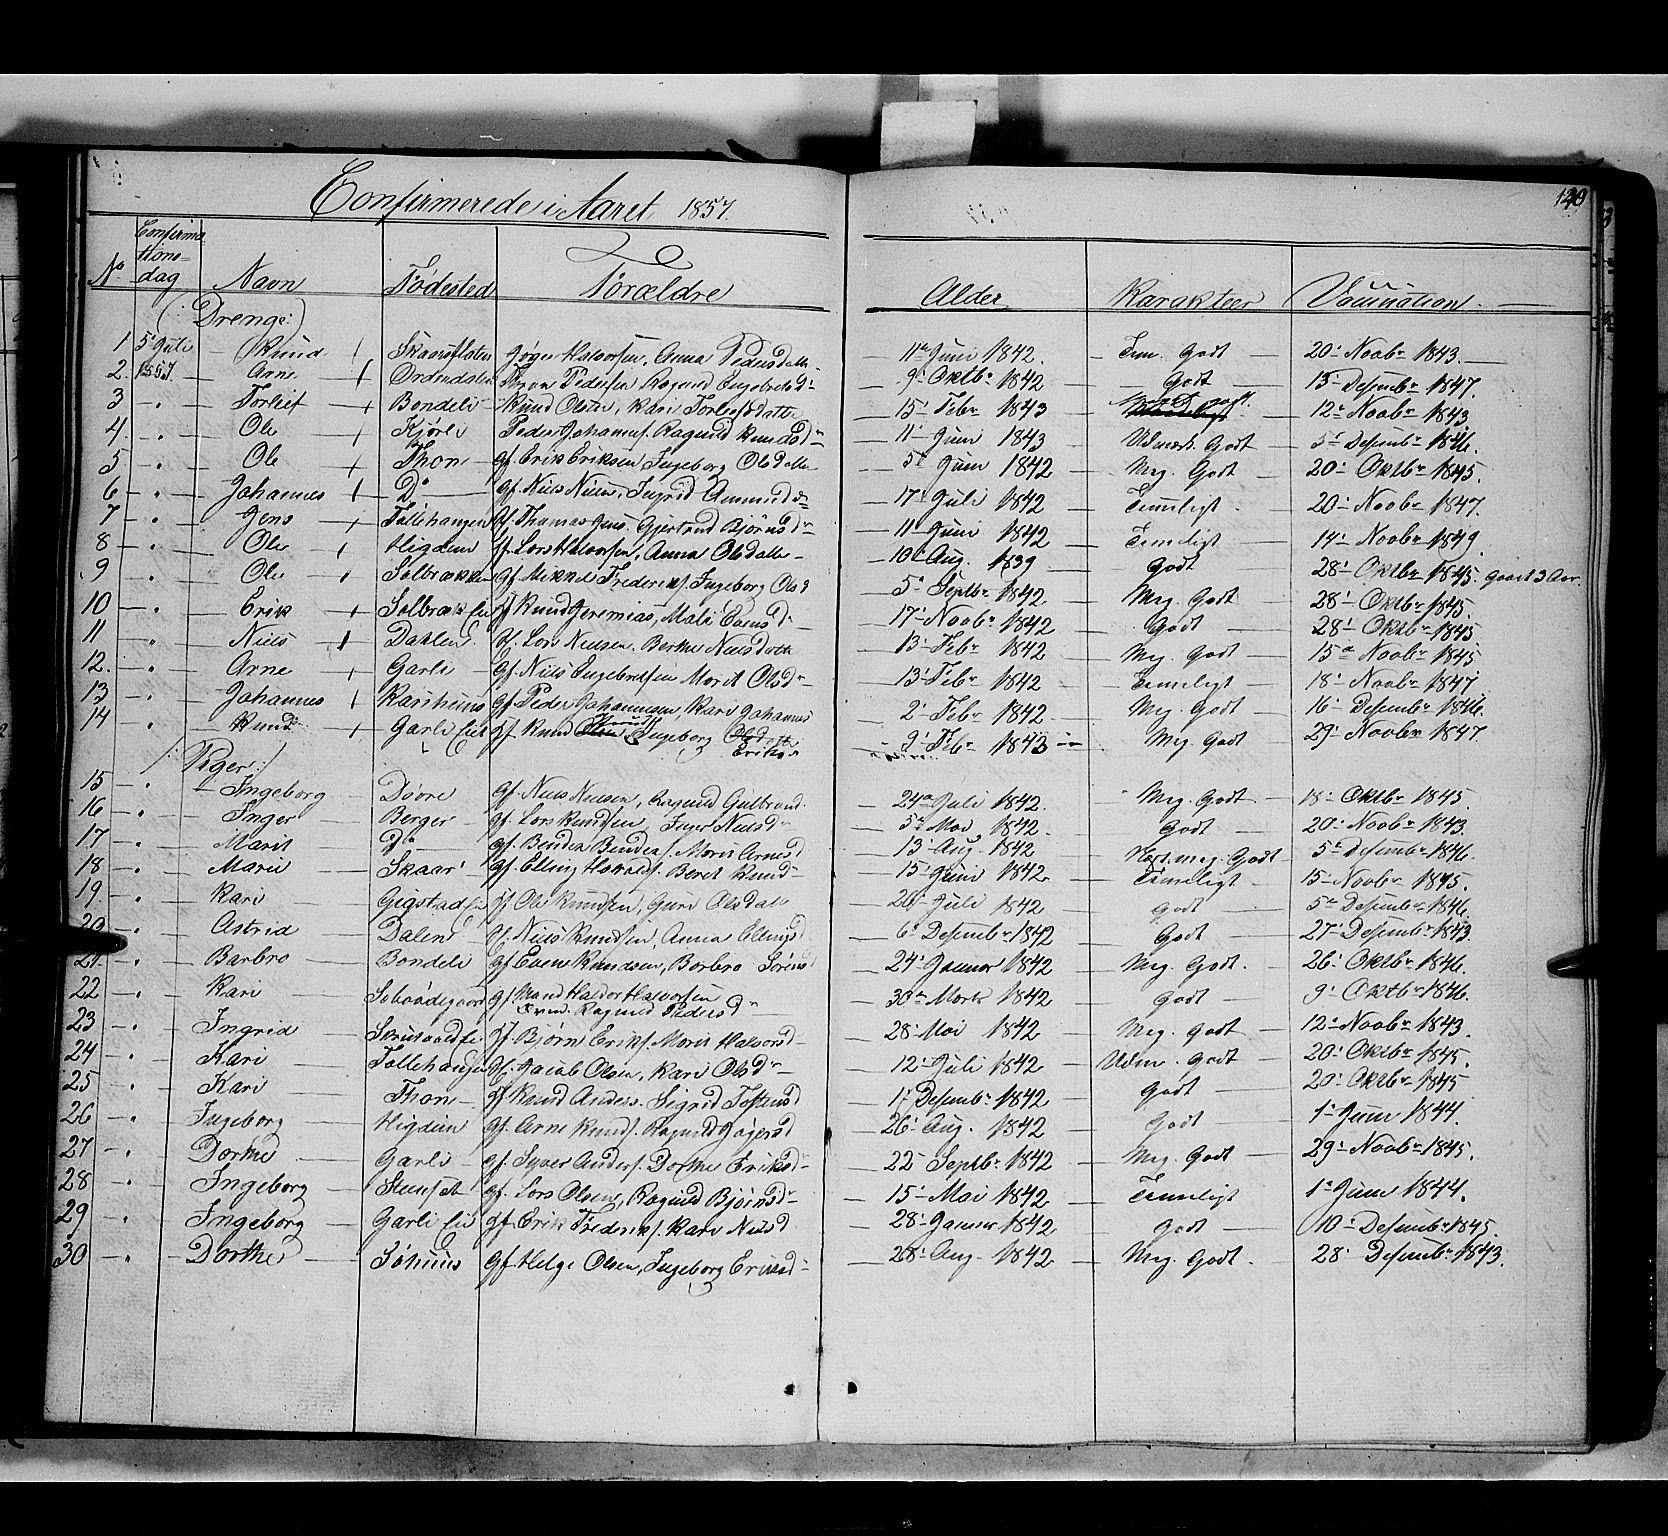 SAH, Nord-Aurdal prestekontor, Ministerialbok nr. 7, 1842-1863, s. 140